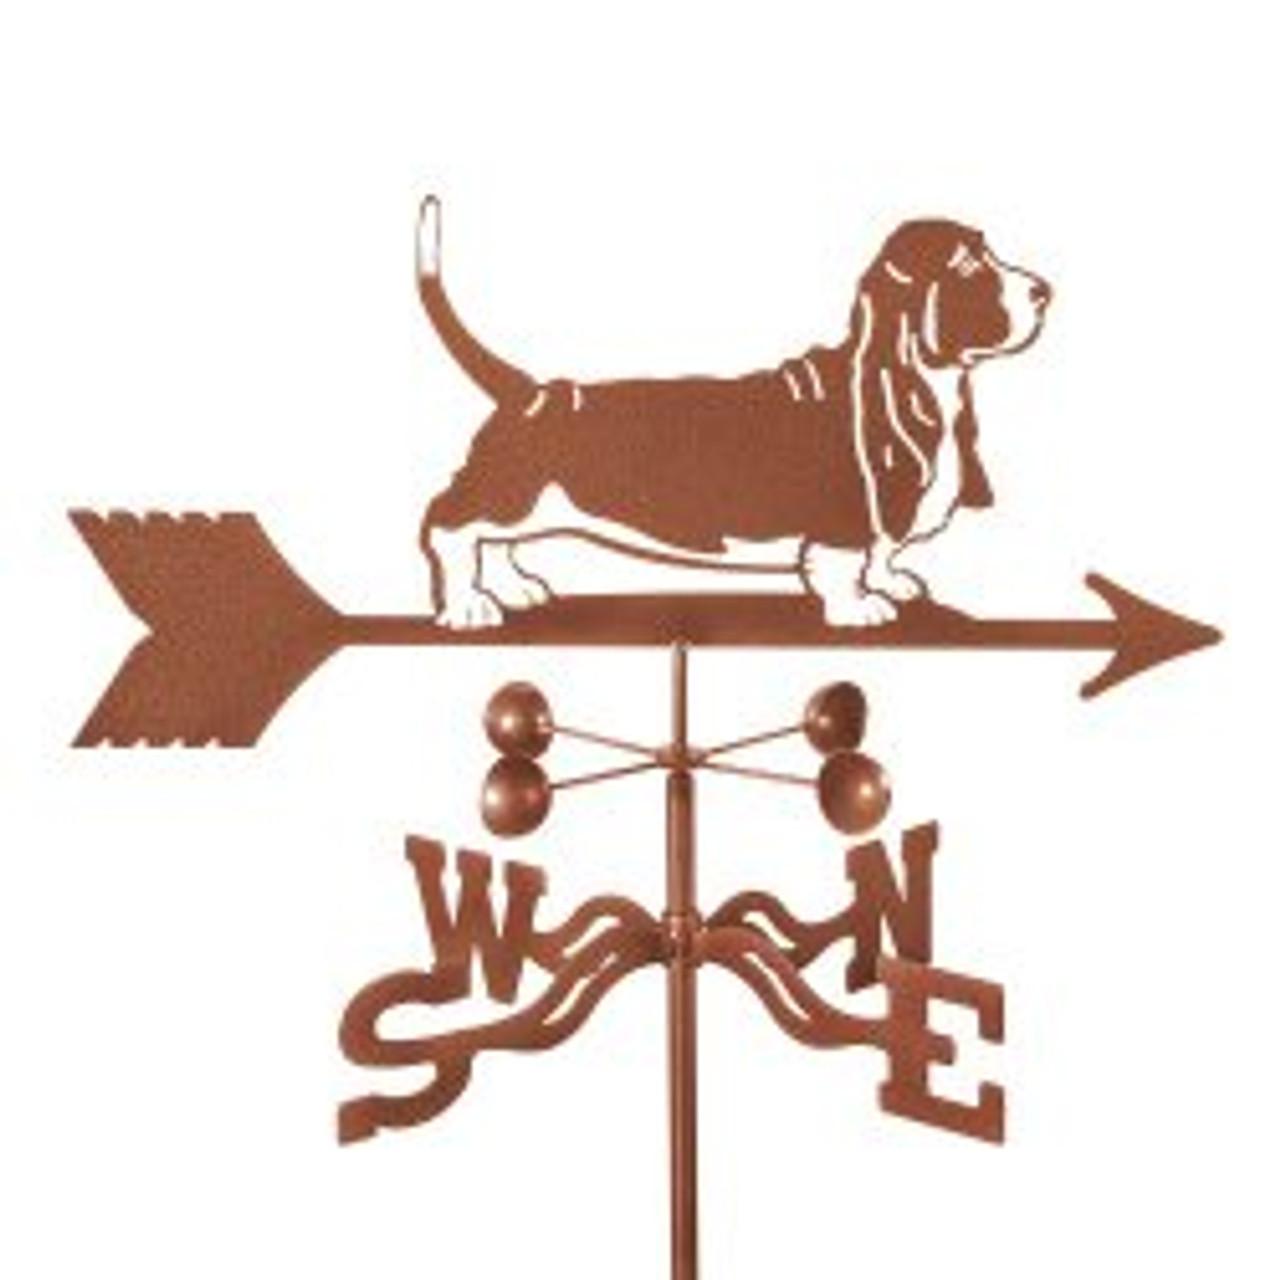 Dog-Basset Hound Weathervane with mount